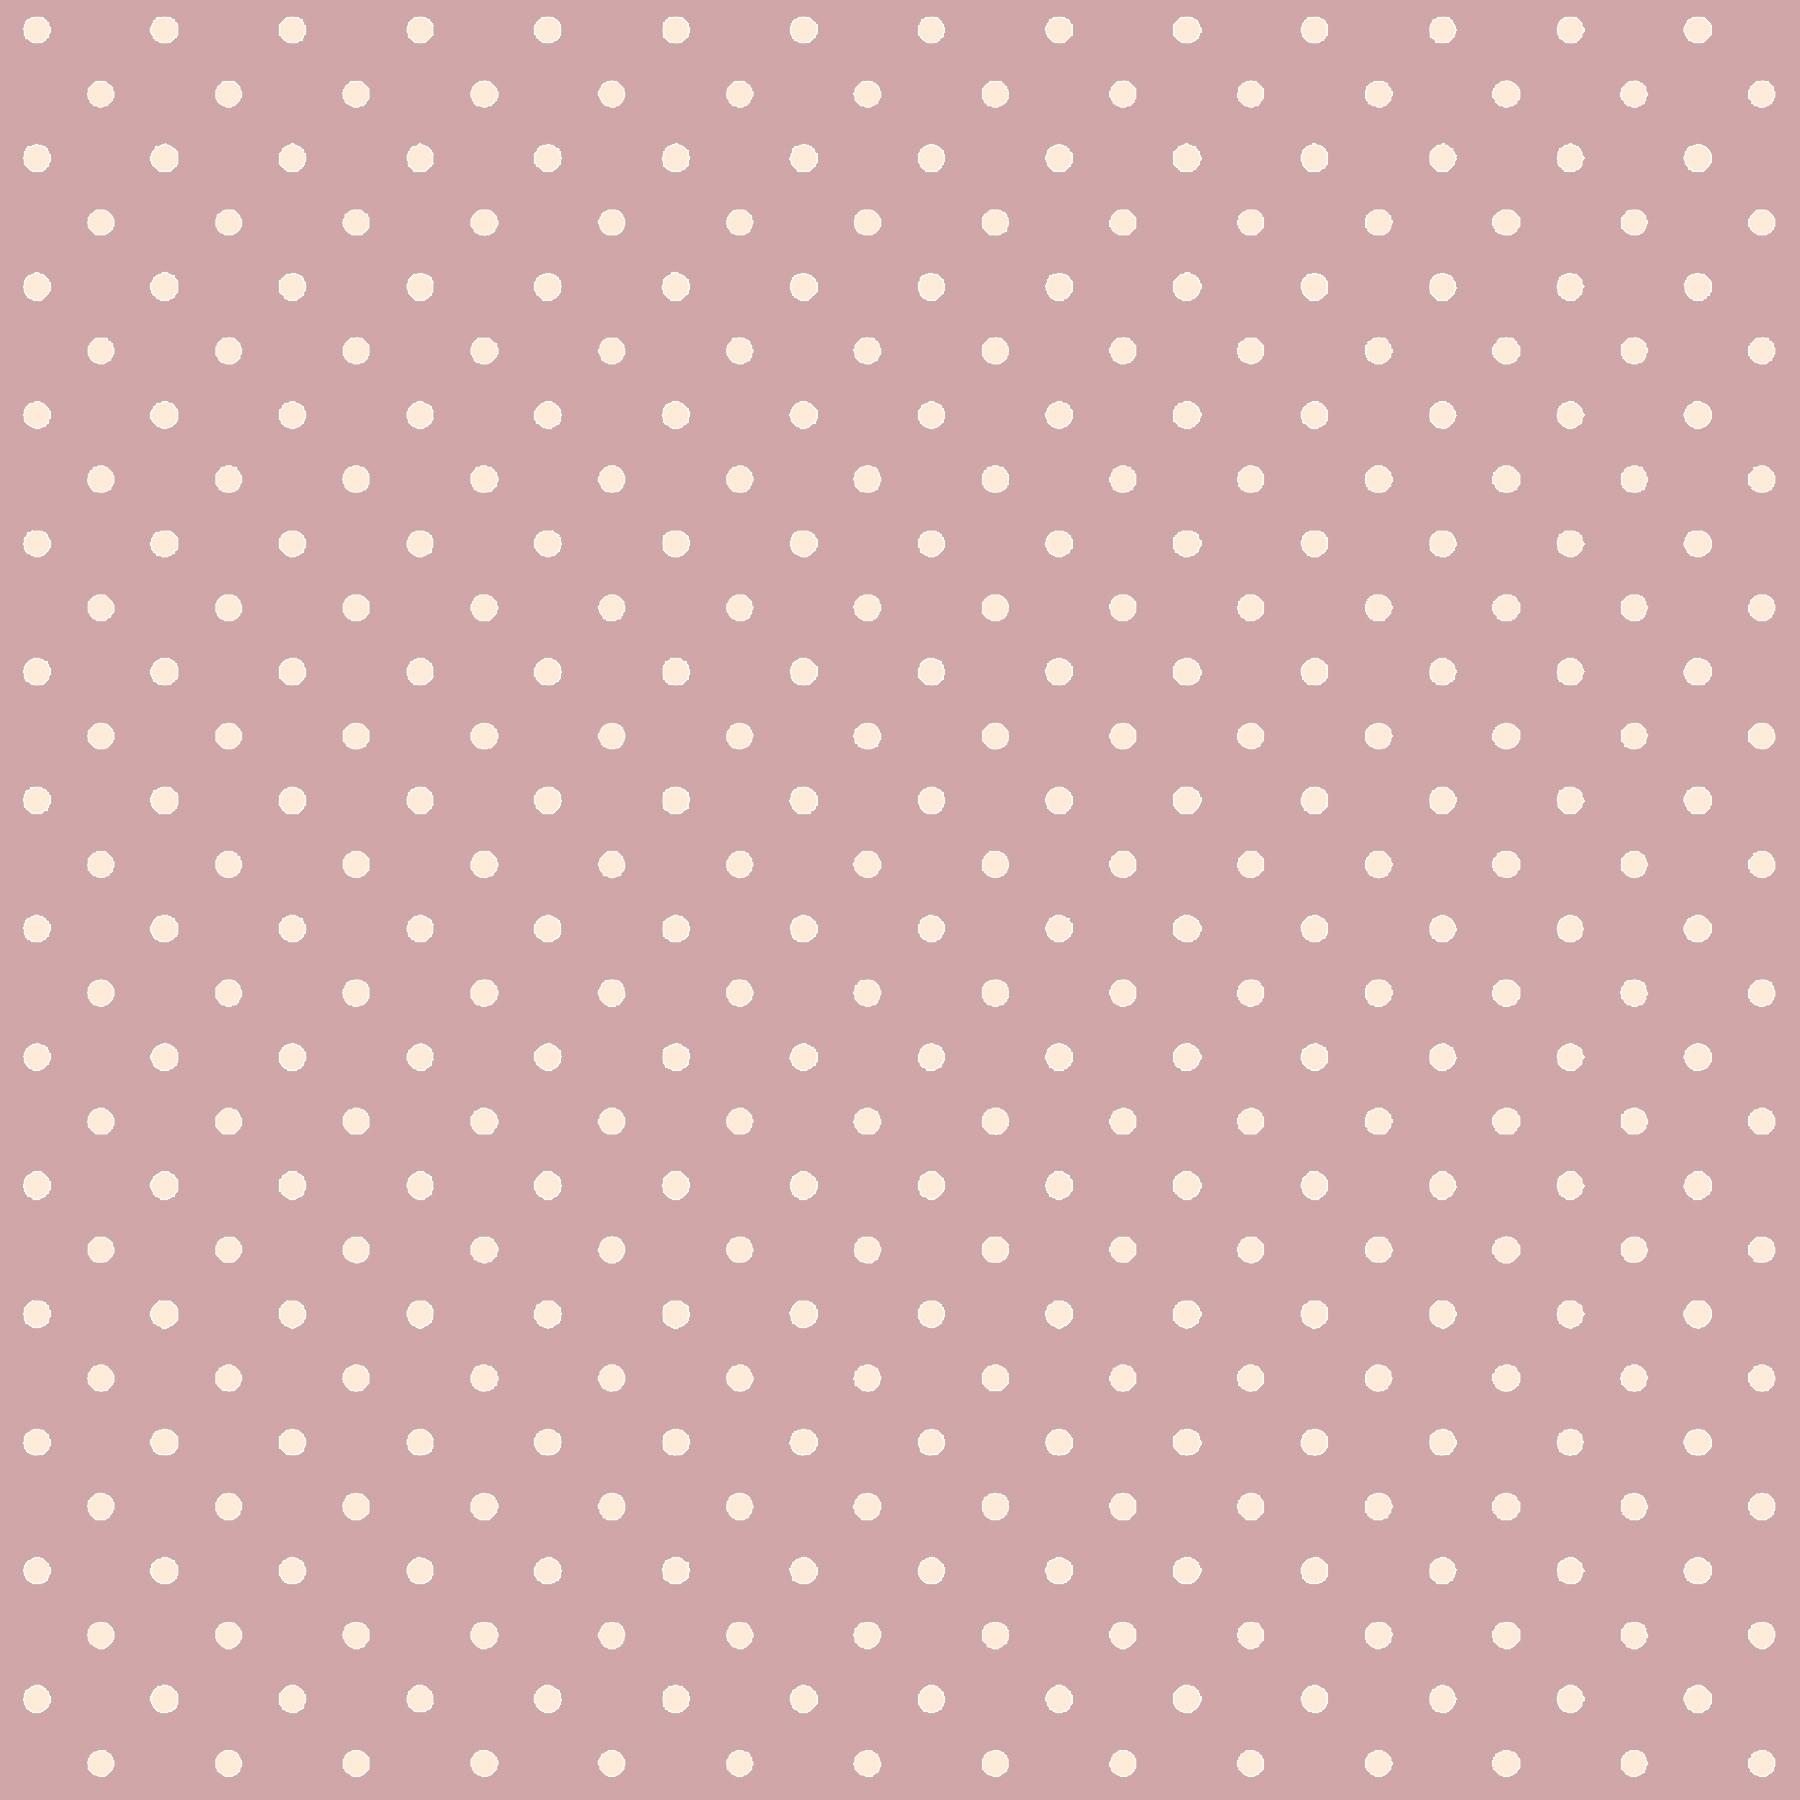 Tecido Tricoline estampado Poá Nude fundo Rosa Chá